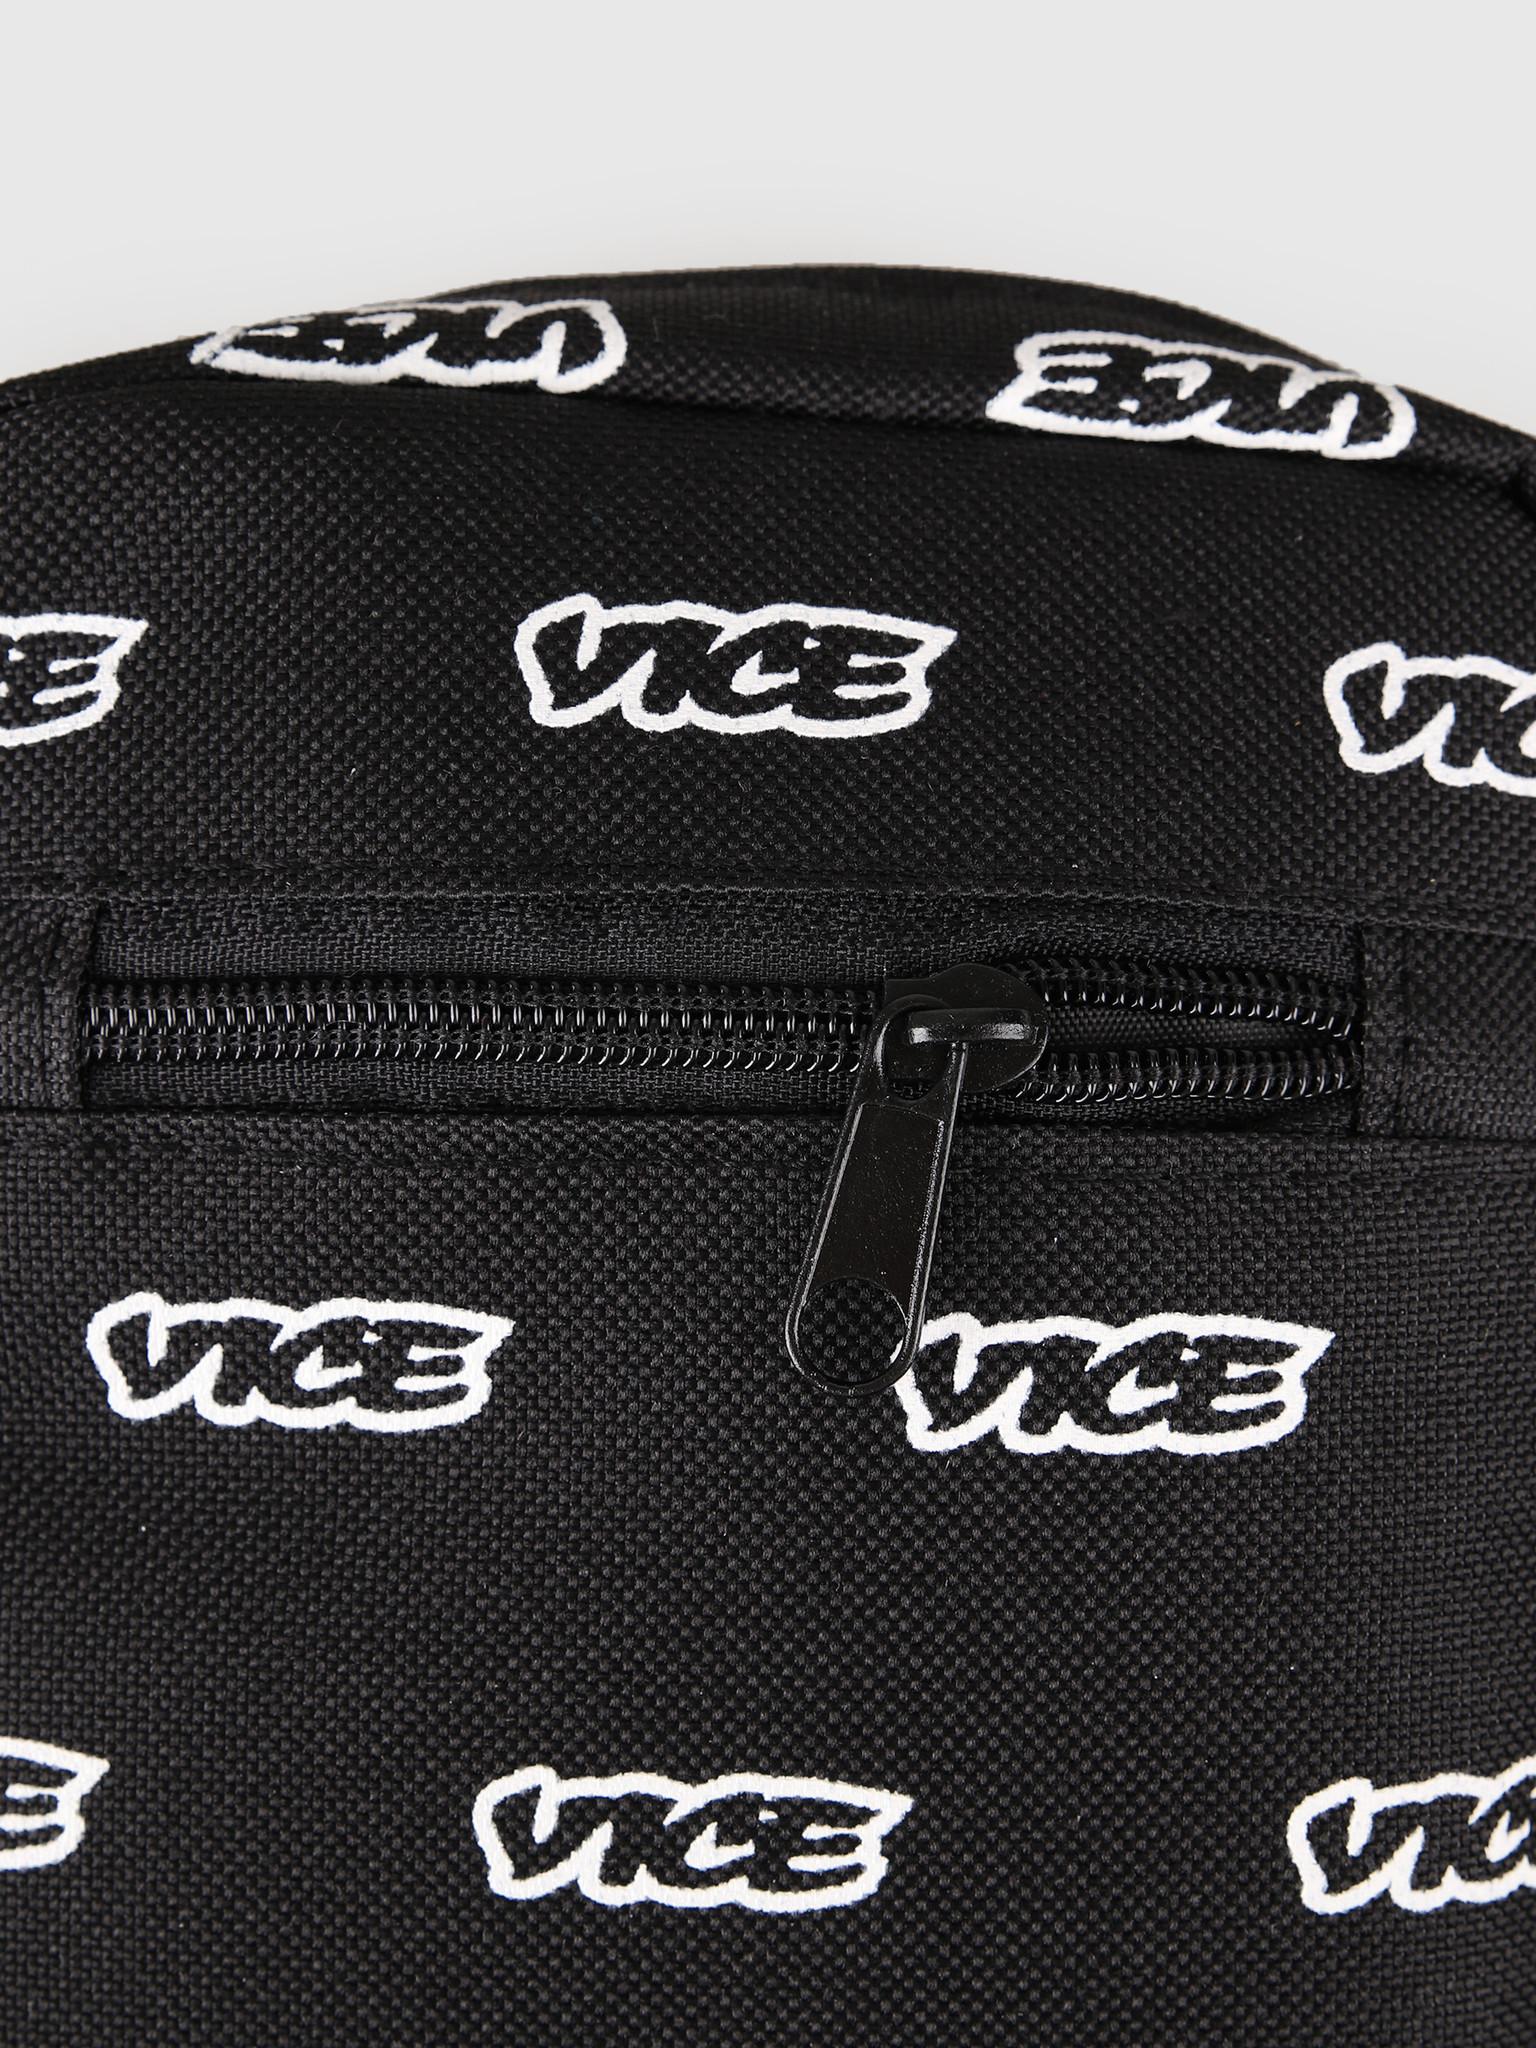 Vice VICE Shoulder Bag Black White